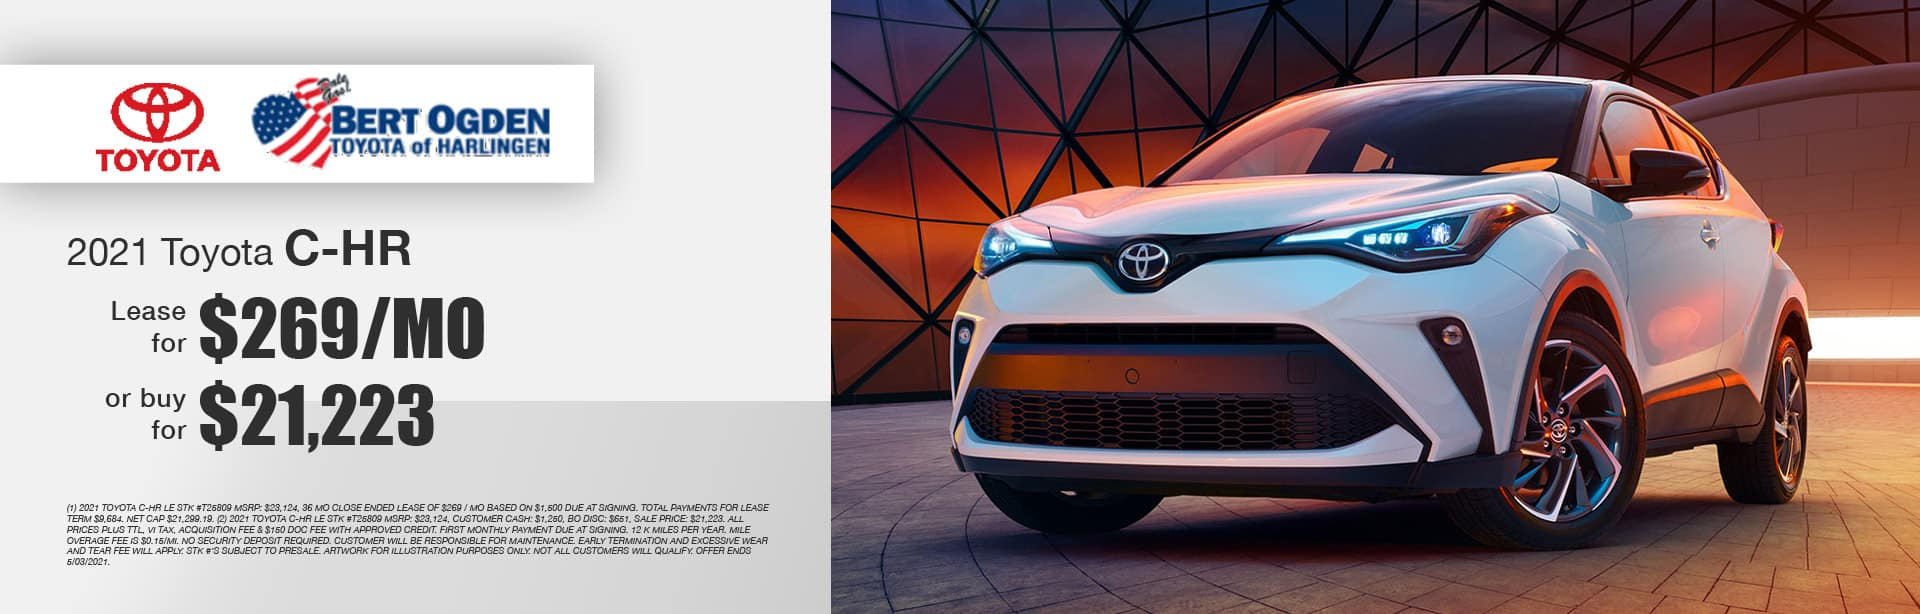 2021 Toyota C-HR LE Offer - Bert Ogden Toyota of Harlingen in Harlingen, Texas